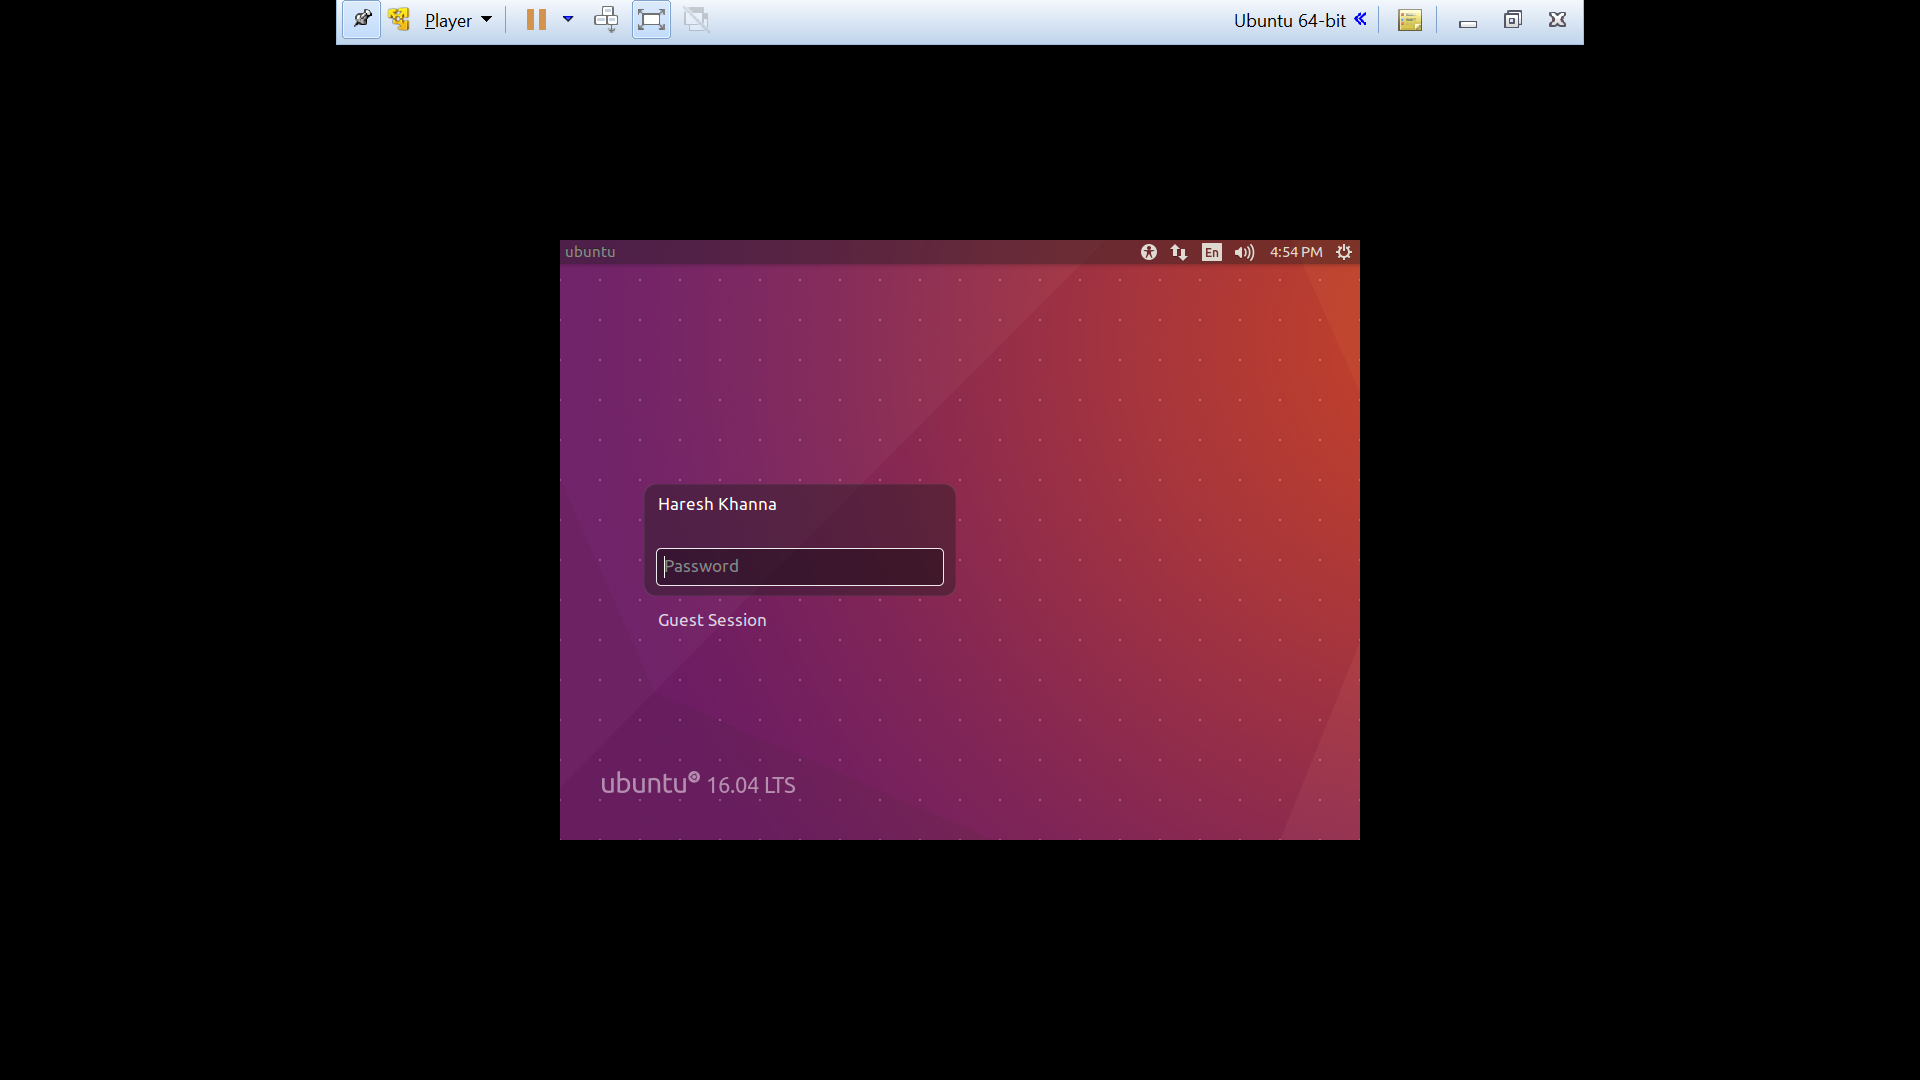 download vmware workstation 12 64 bit linux